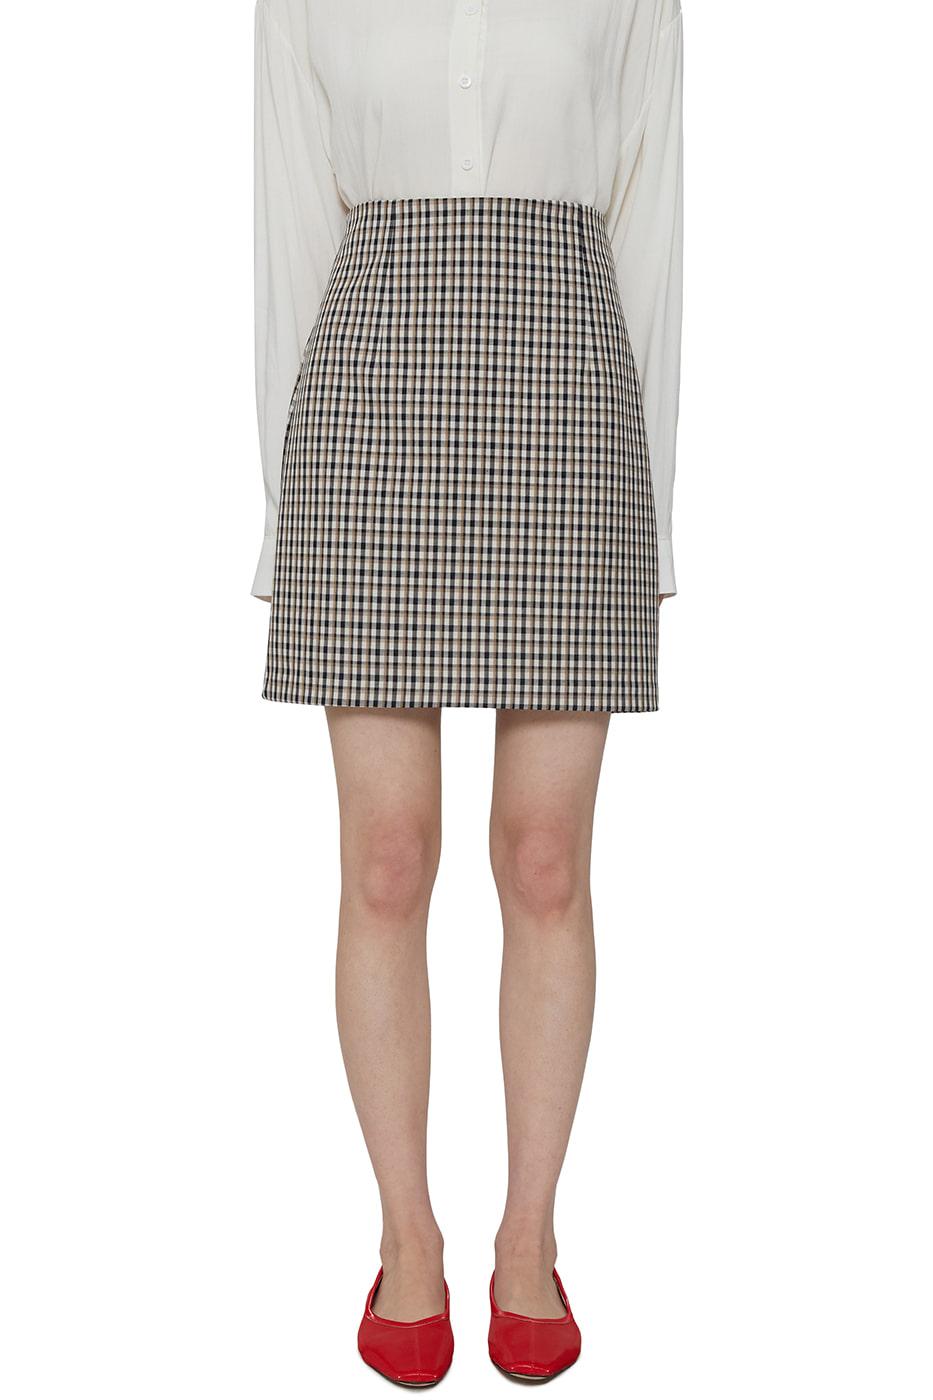 Charming check mini skirt